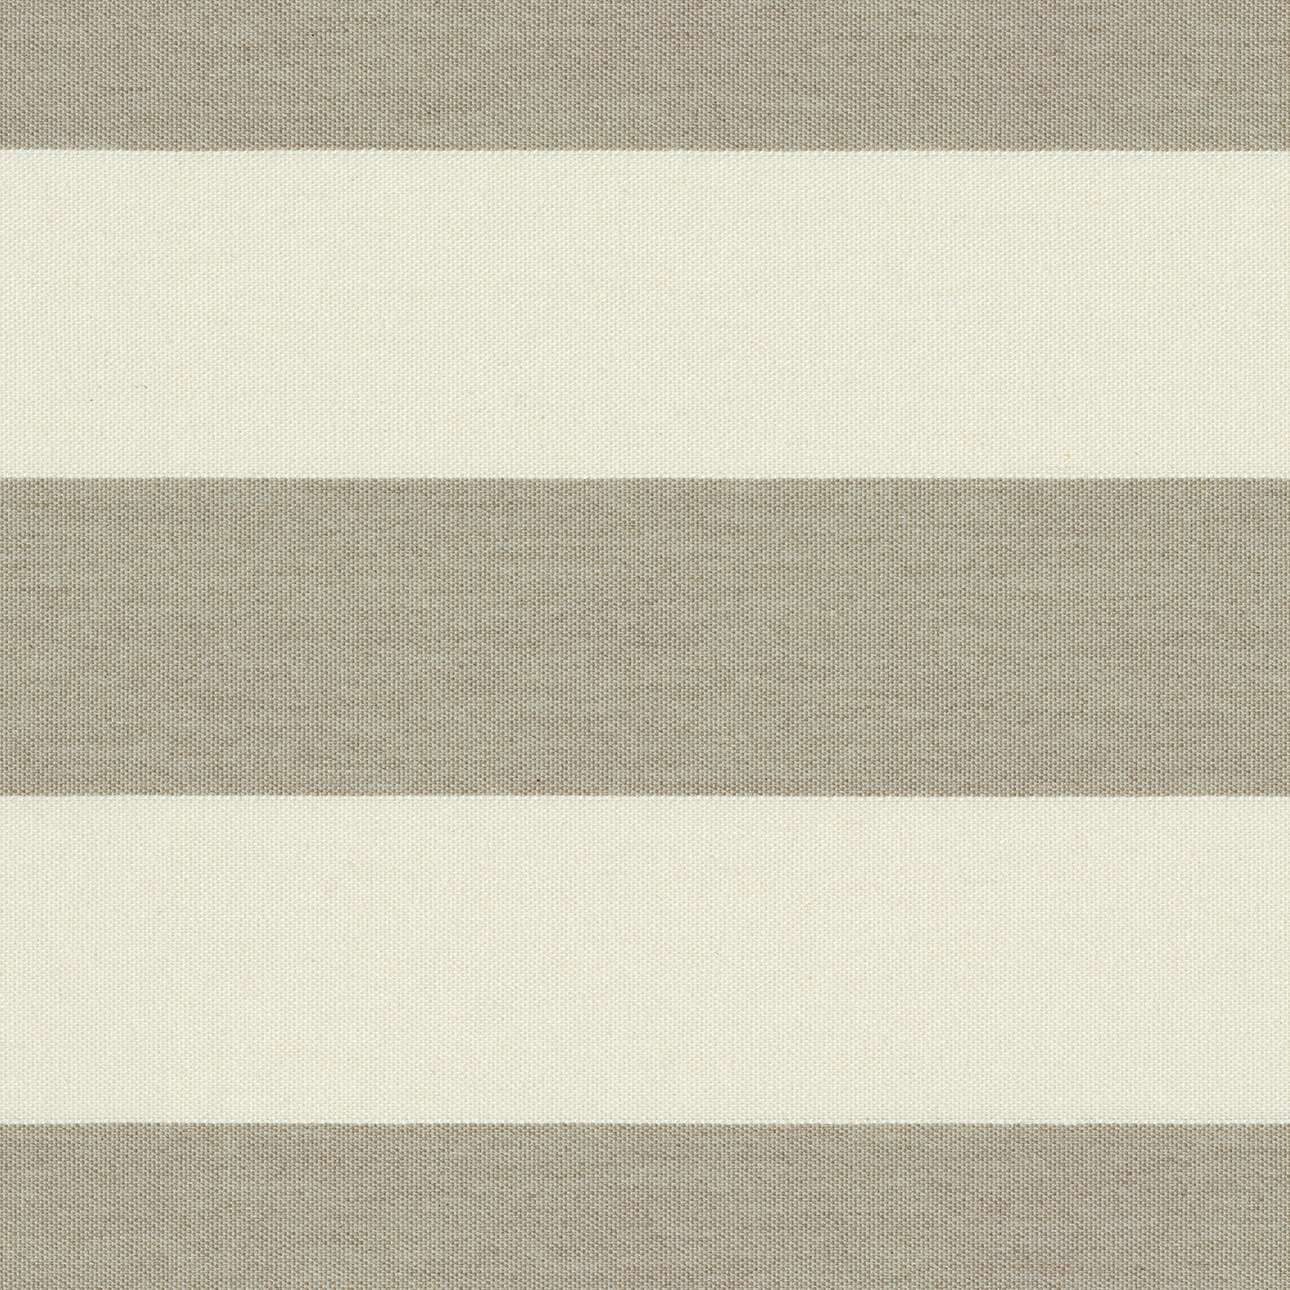 Quadro II 142-73 fra kollektionen Quadro II, Stof: 142-73